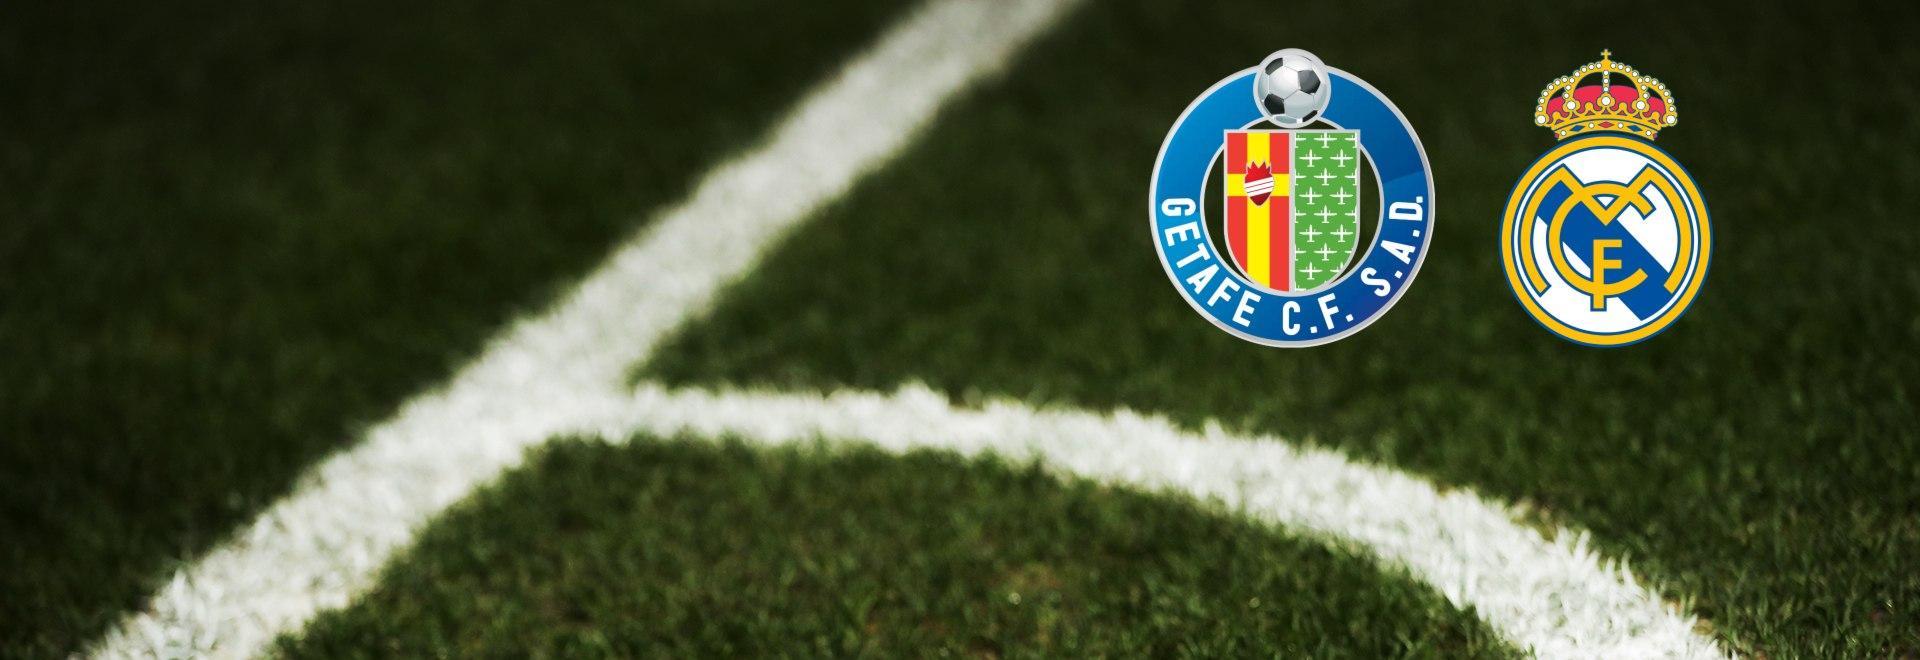 Getafe - Real Madrid. 33a g.